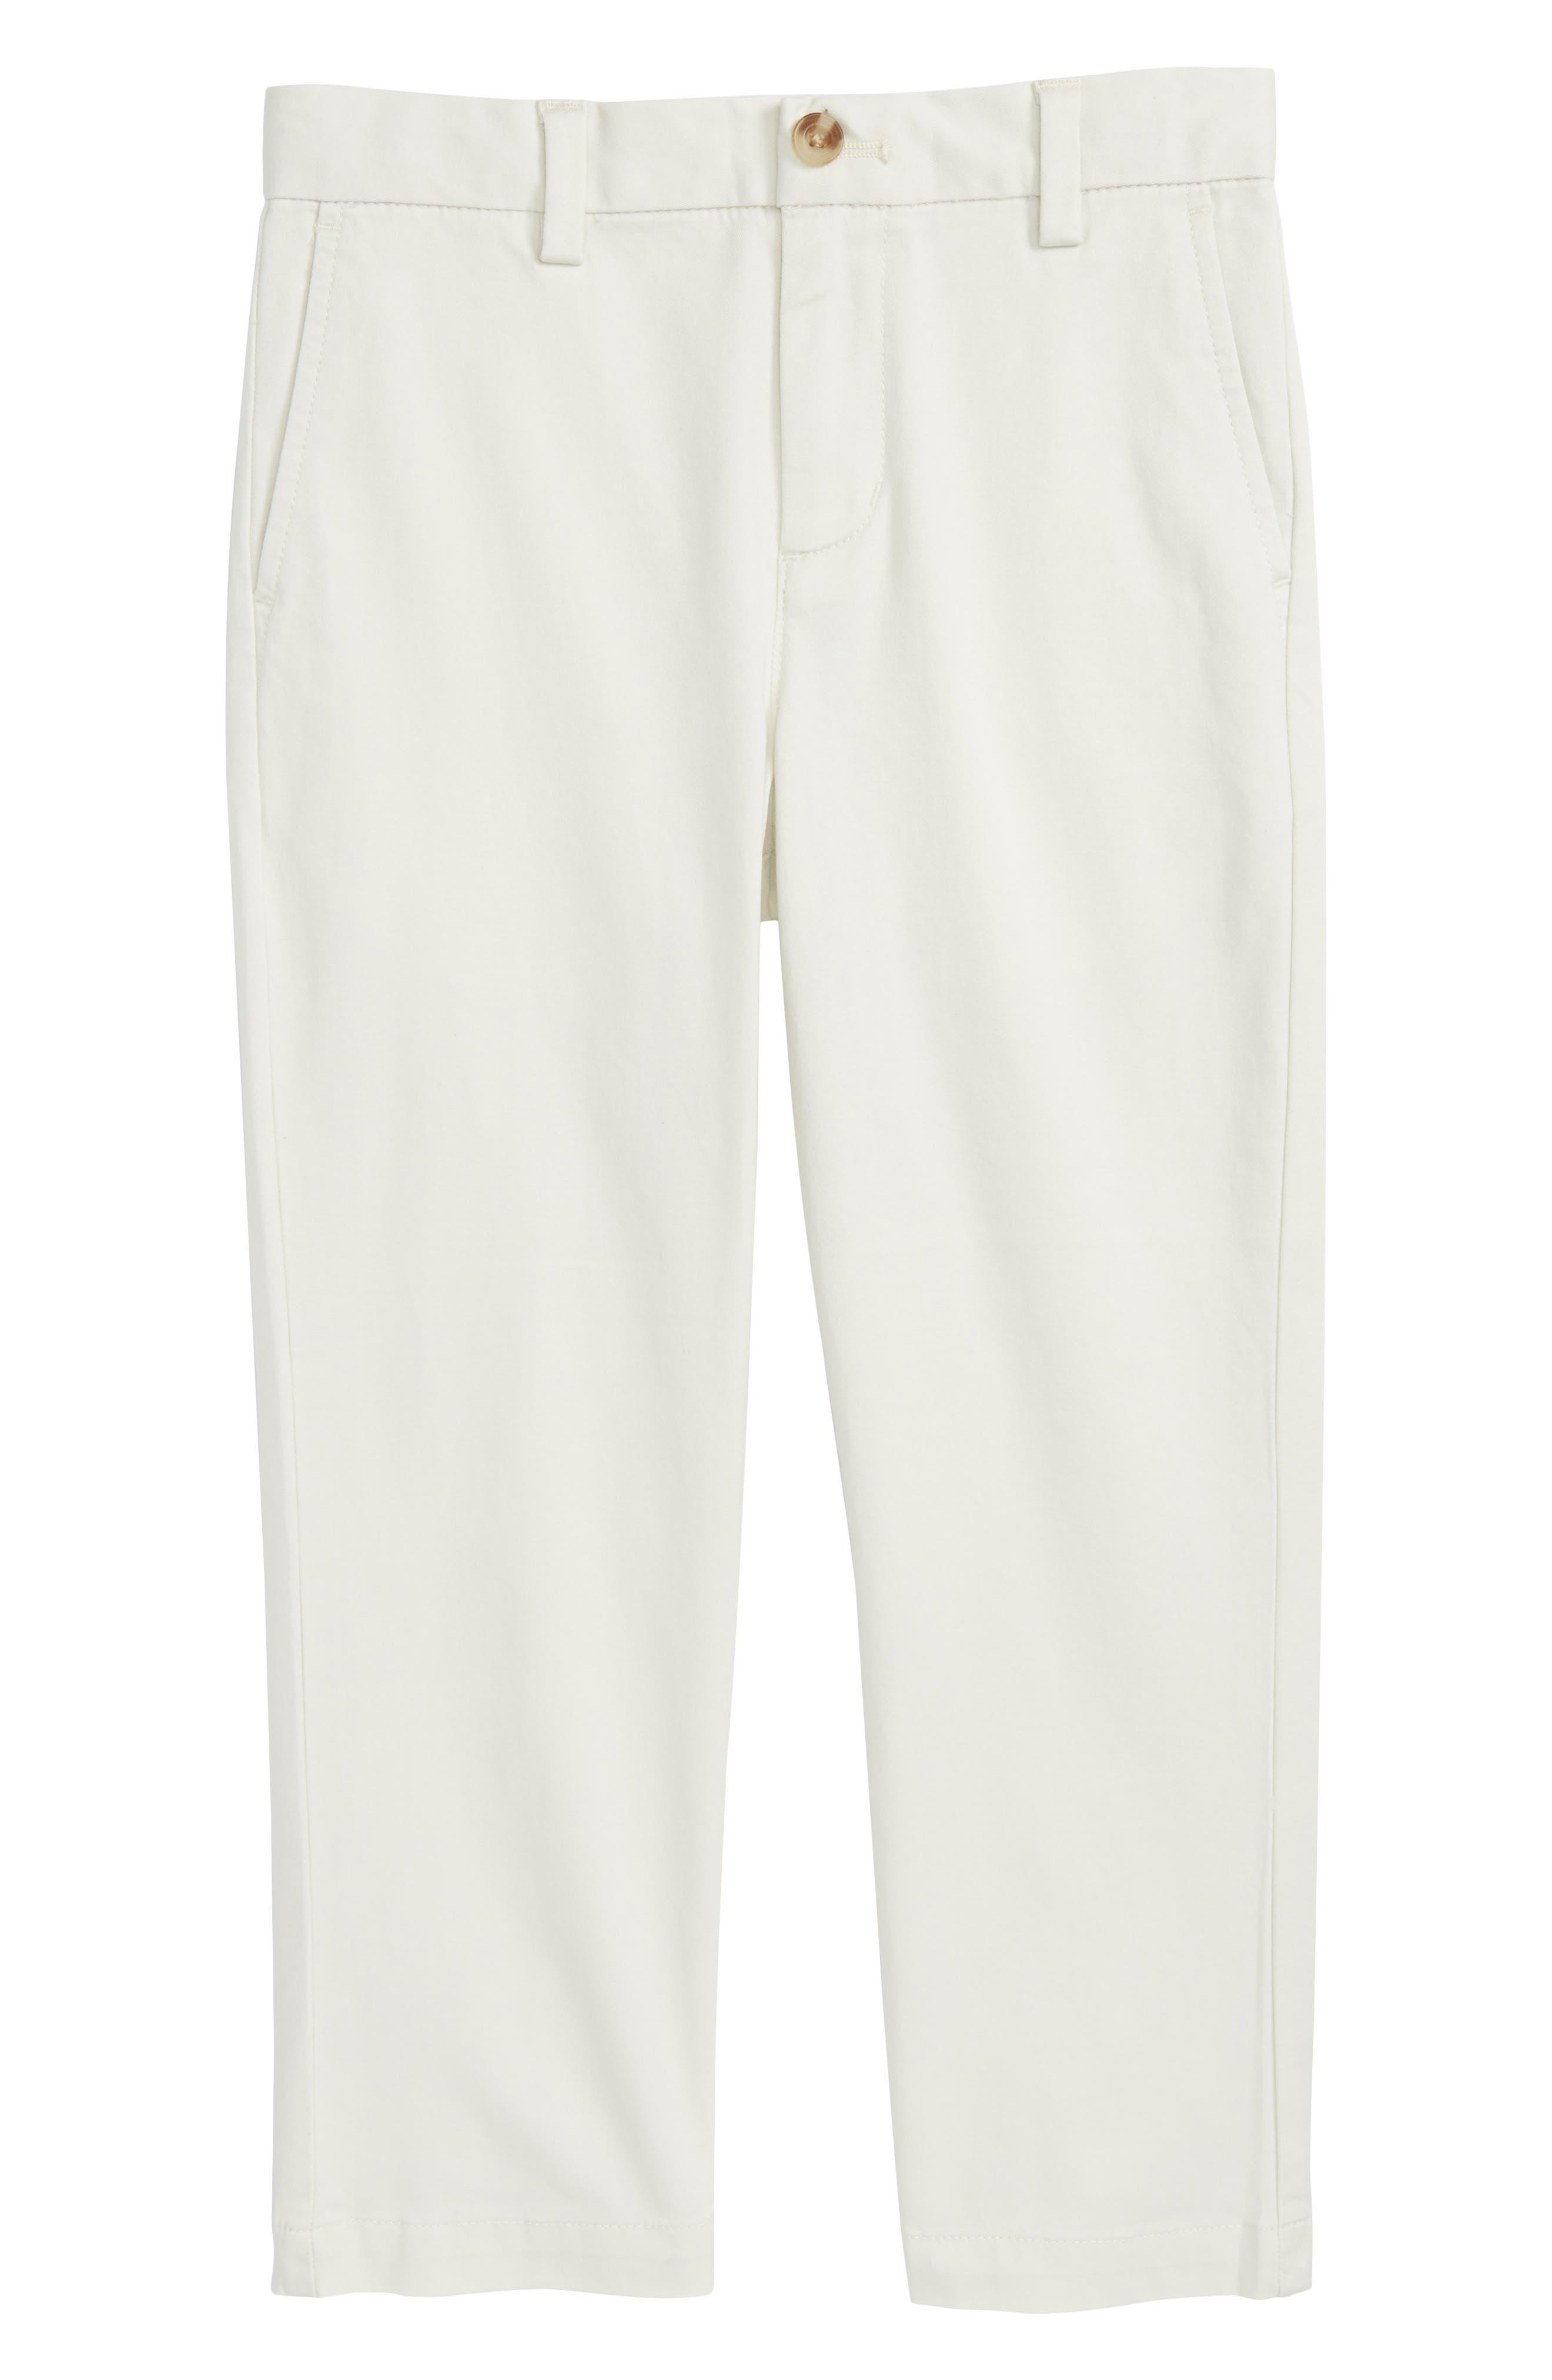 Breaker Pants,                         Main,                         color, Stone